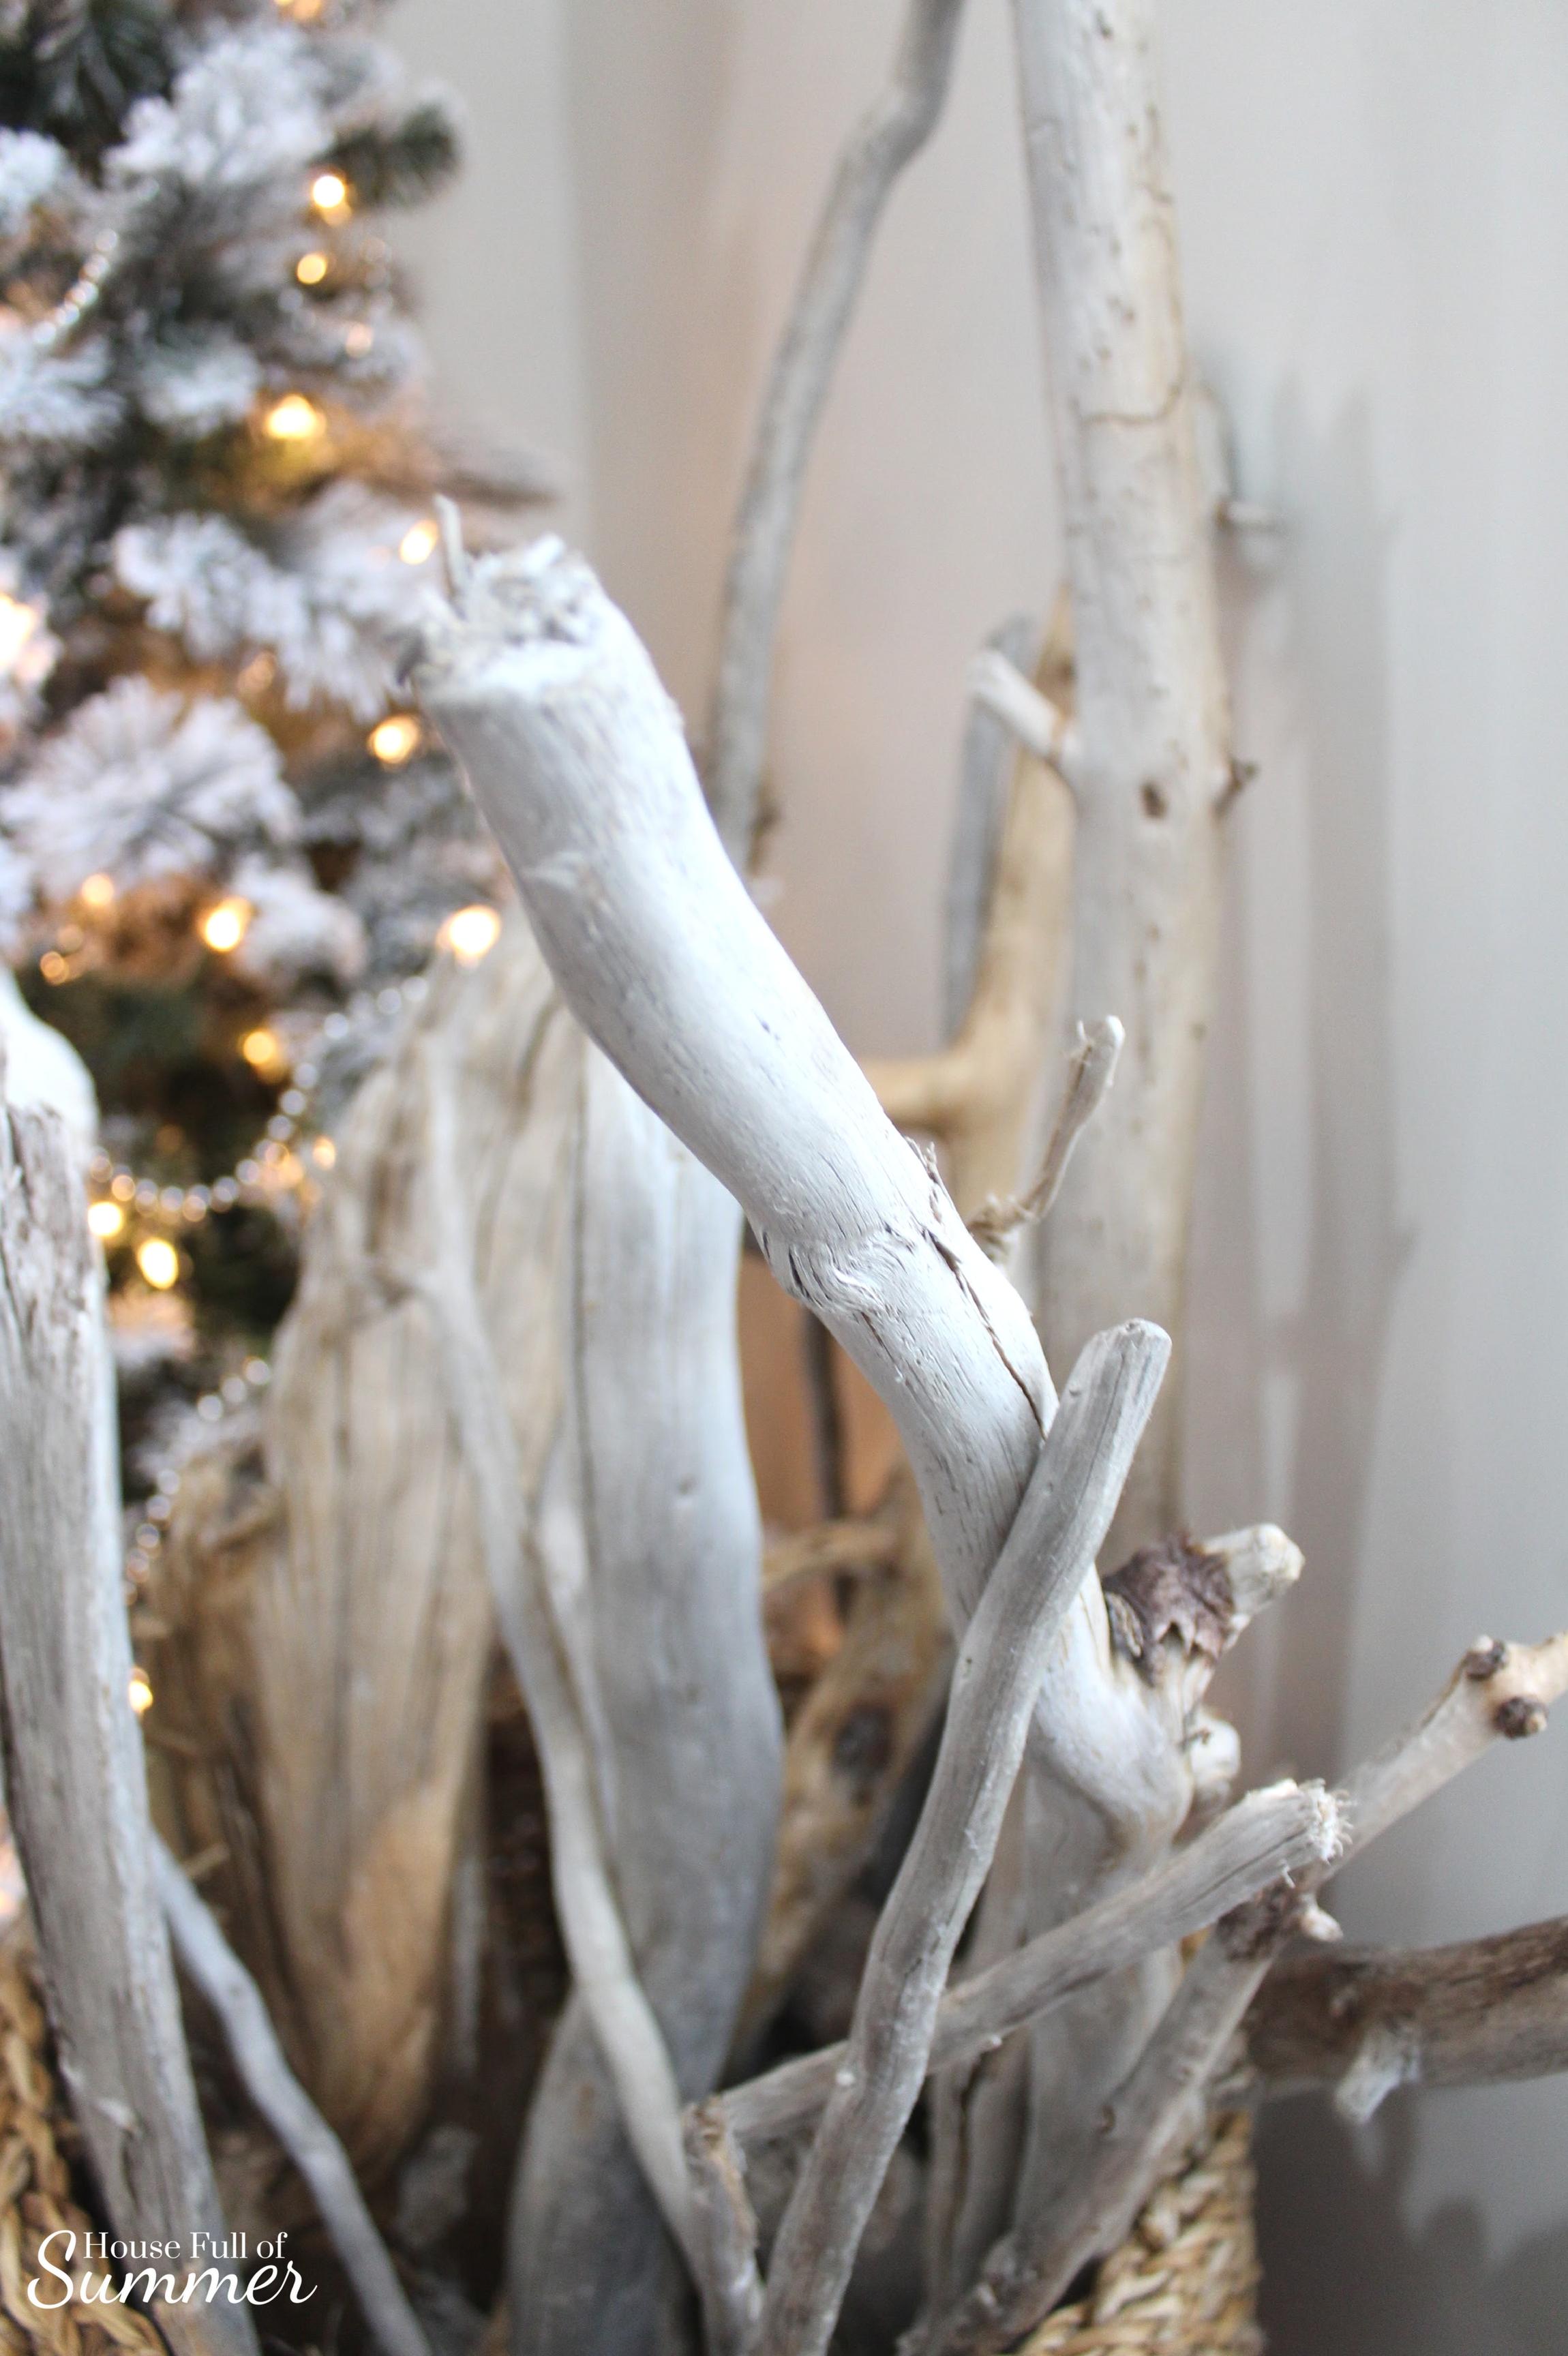 Classy Christmas Home Tour {Part Two} | House Full of Summer blog - mantel decor, christmas mantel ideas, coastal christmas mantel, silver and gold coastal decor, windows over mantel, driftwood in basket